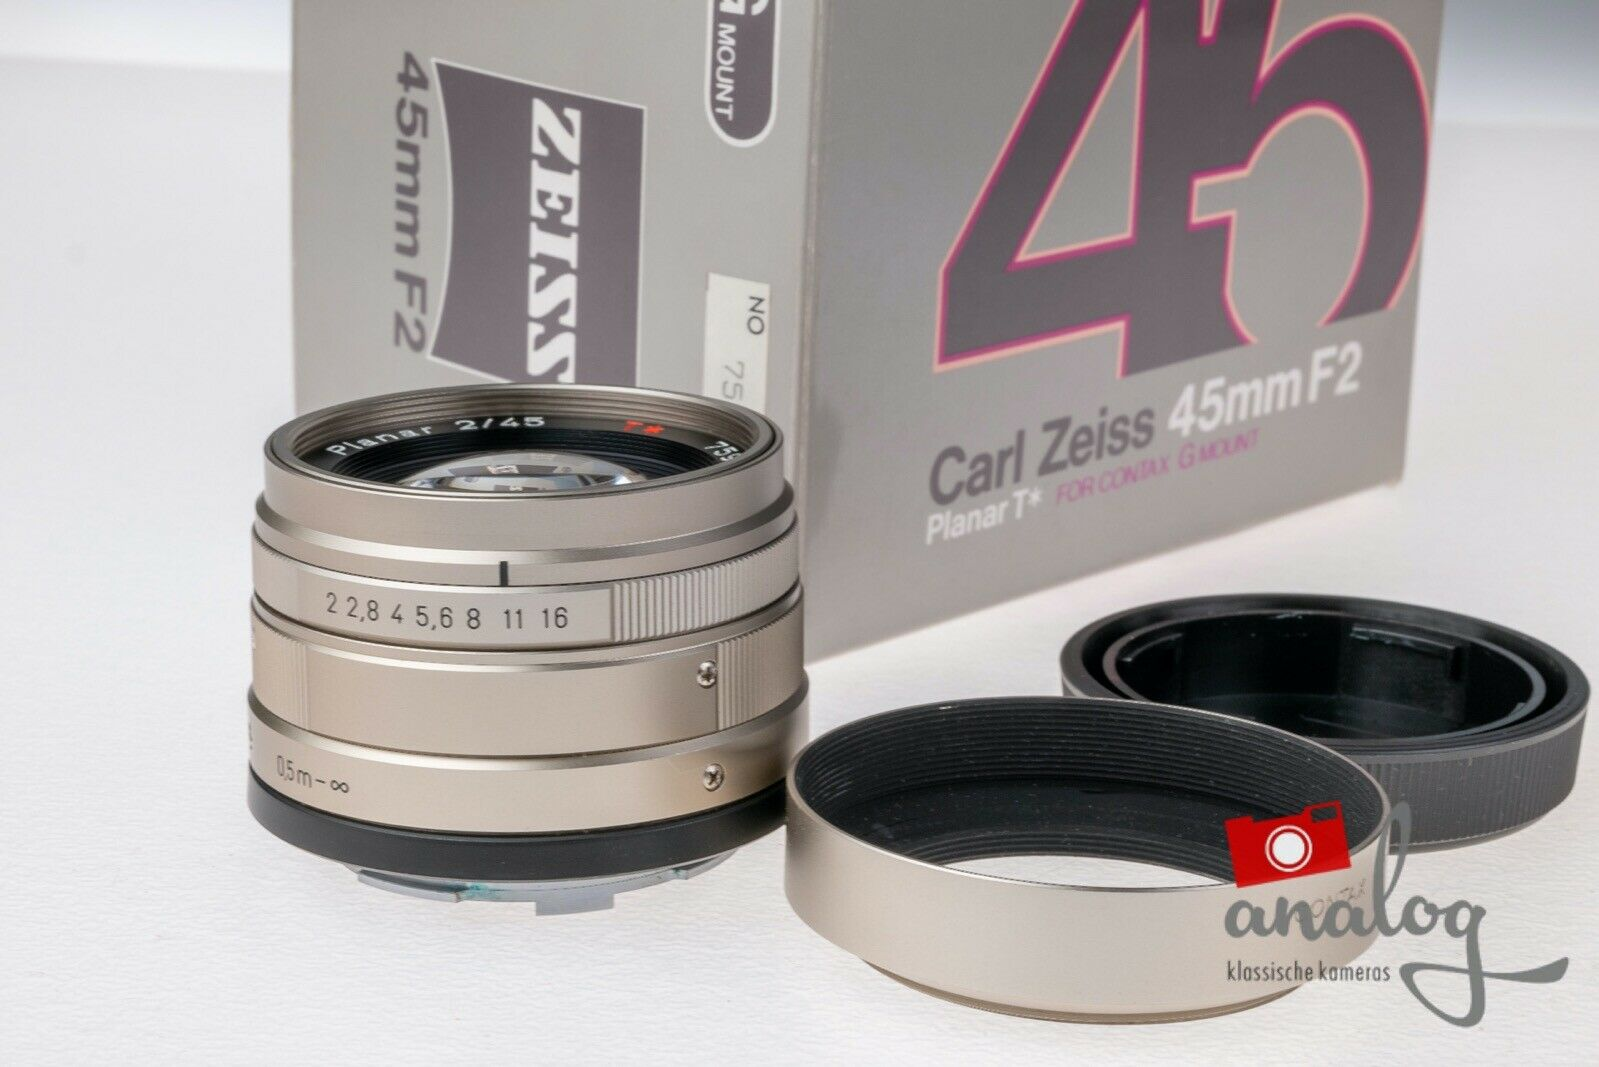 Contax Carl Zeiss Planar 45mm 2.0 für Contax G1 / Contax G2